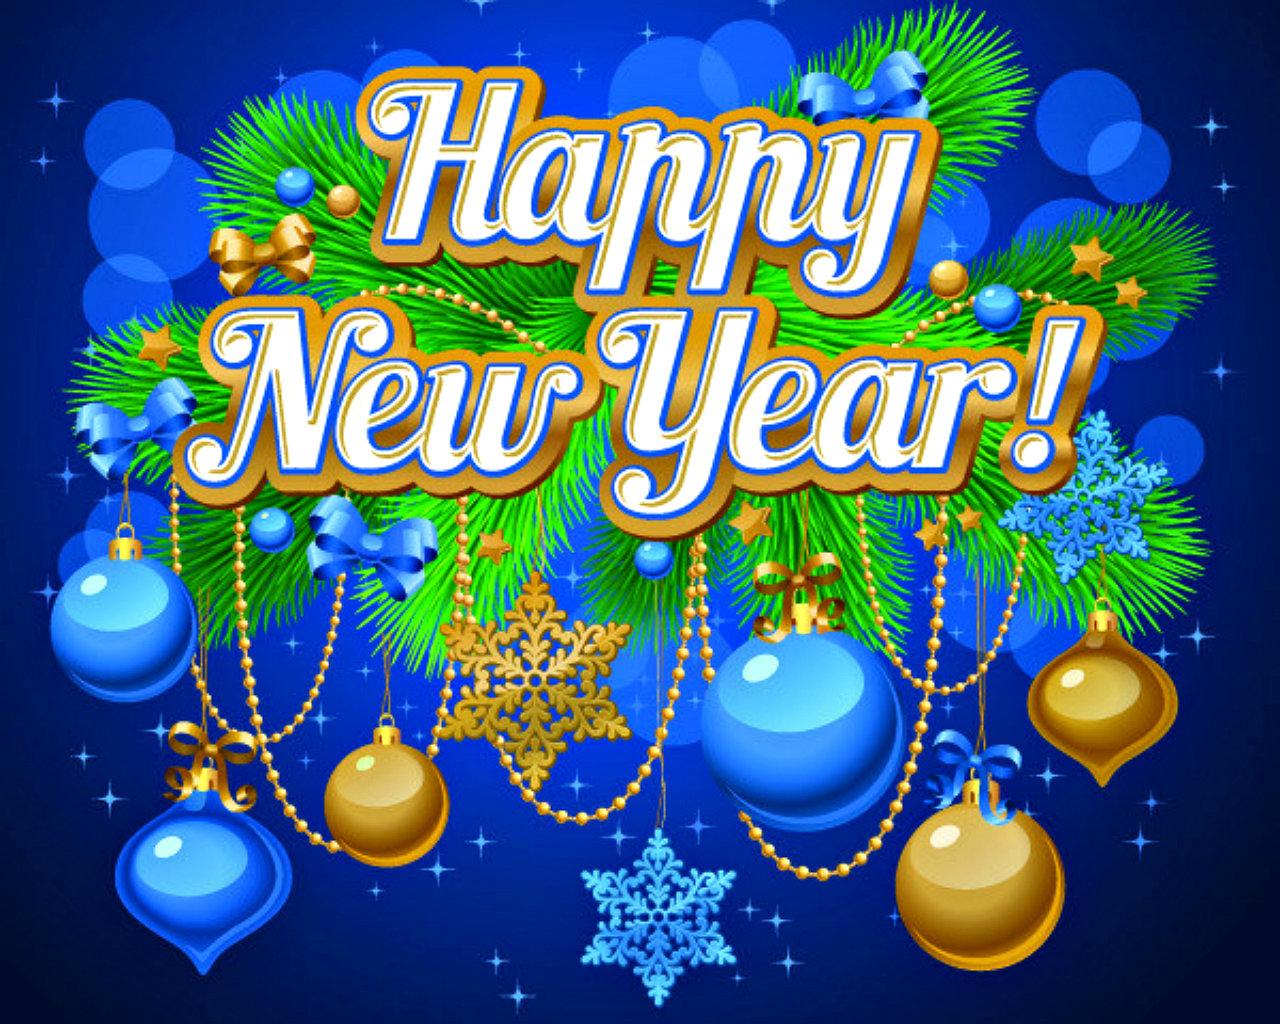 D Happy New Year wallpaper 1280x1024